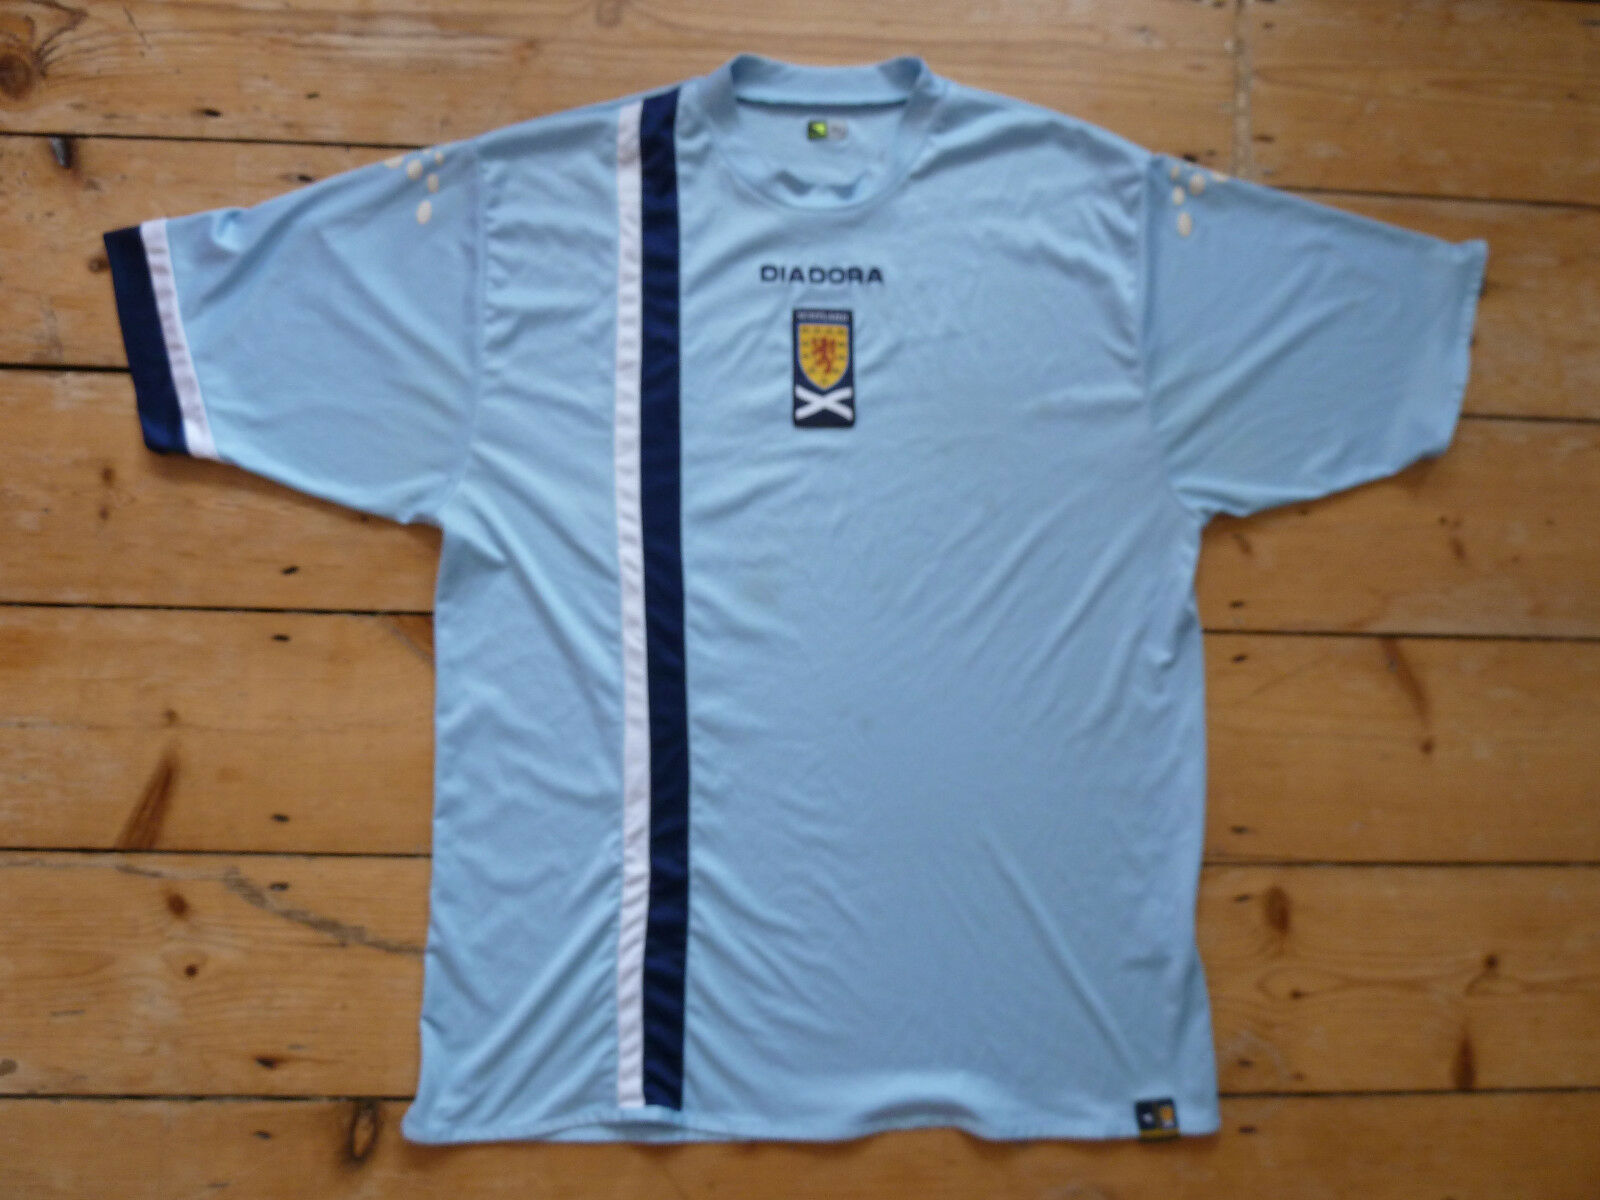 Schottland Fußball Shirt XL 2005 S/S Tartan Army a. Alba B.E Albannach Soar Alba a. e4903f